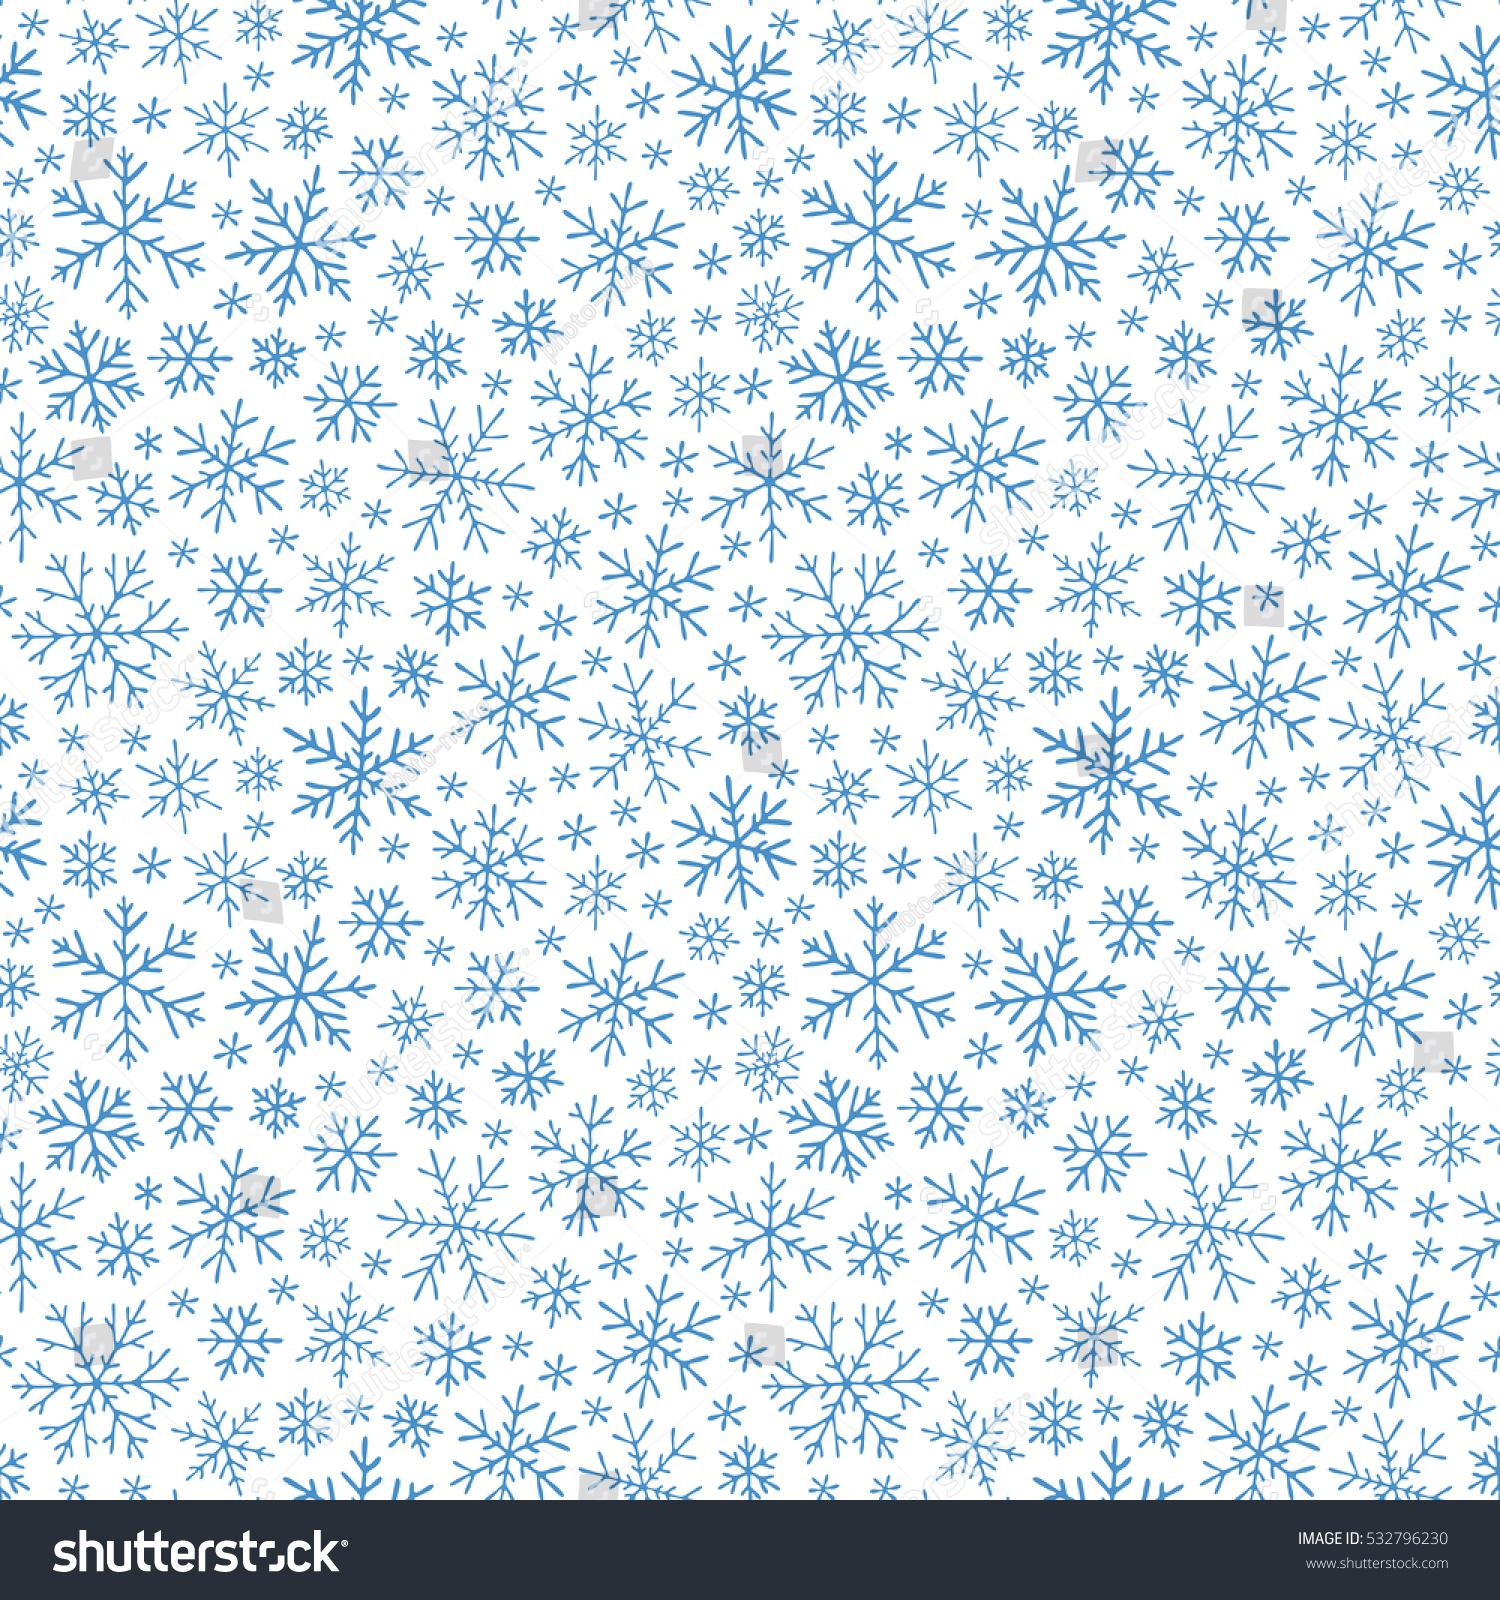 snow vector pattern - photo #10